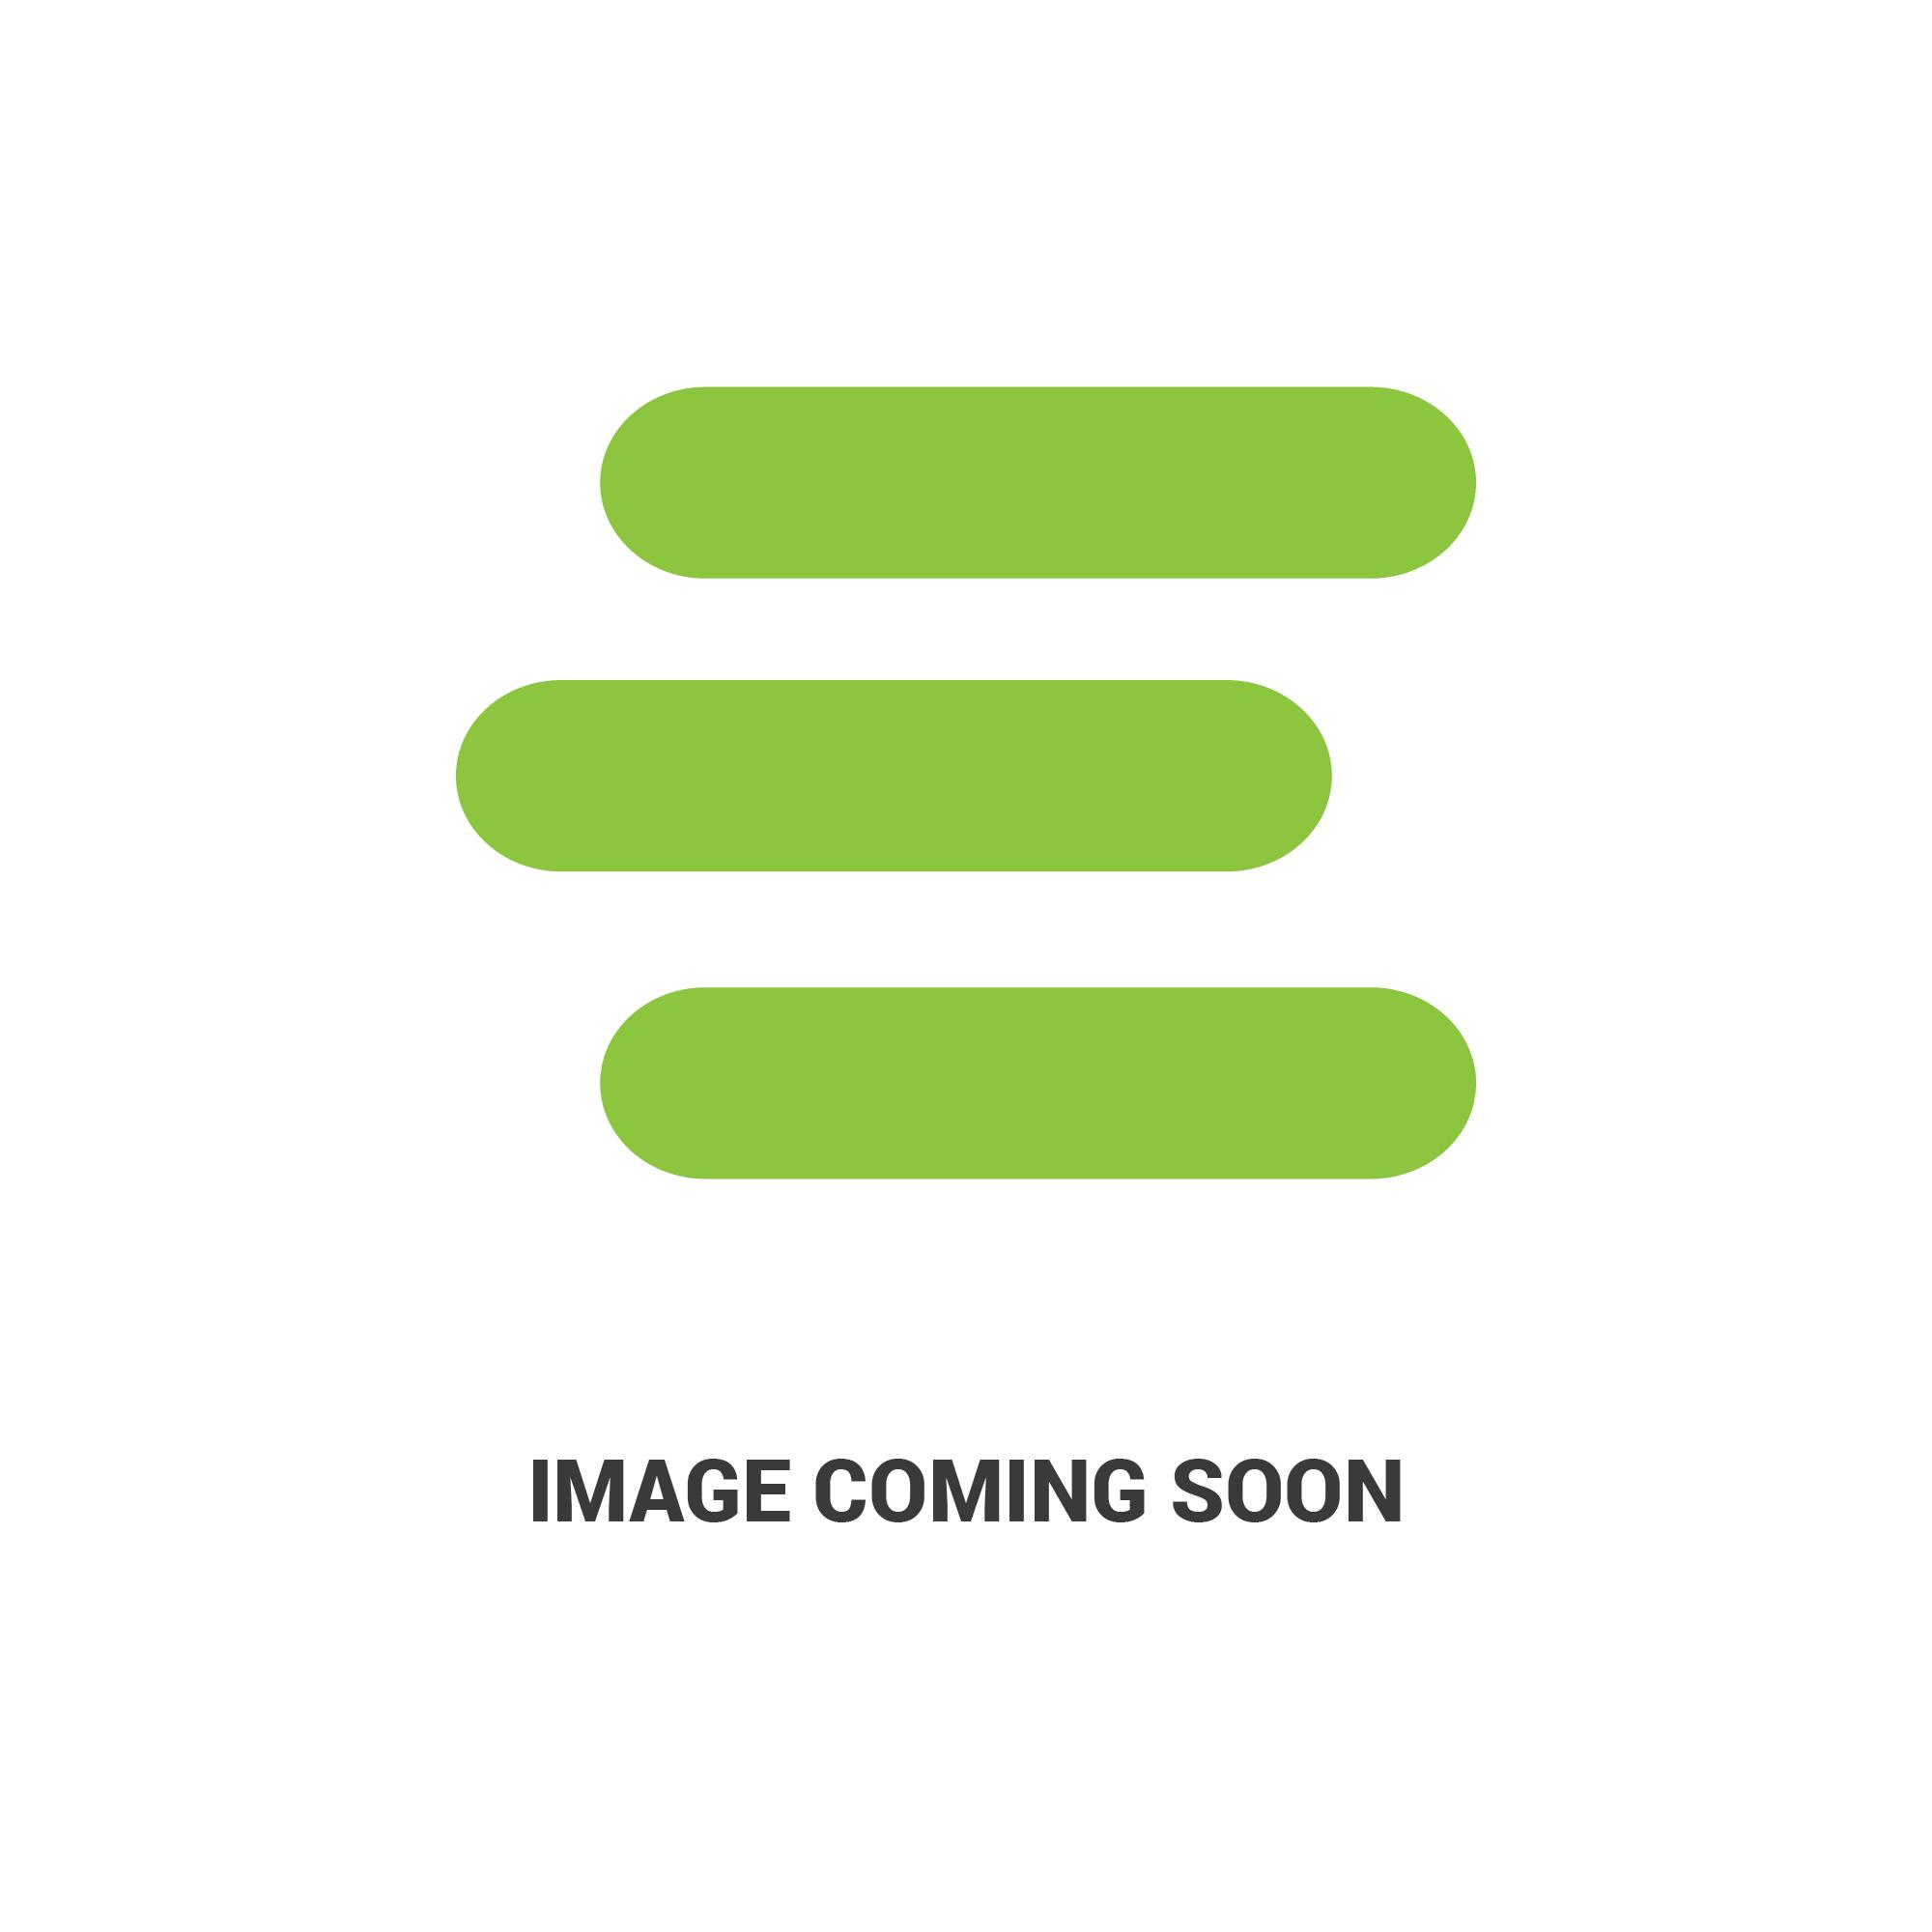 E-6680852edit 1.jpg